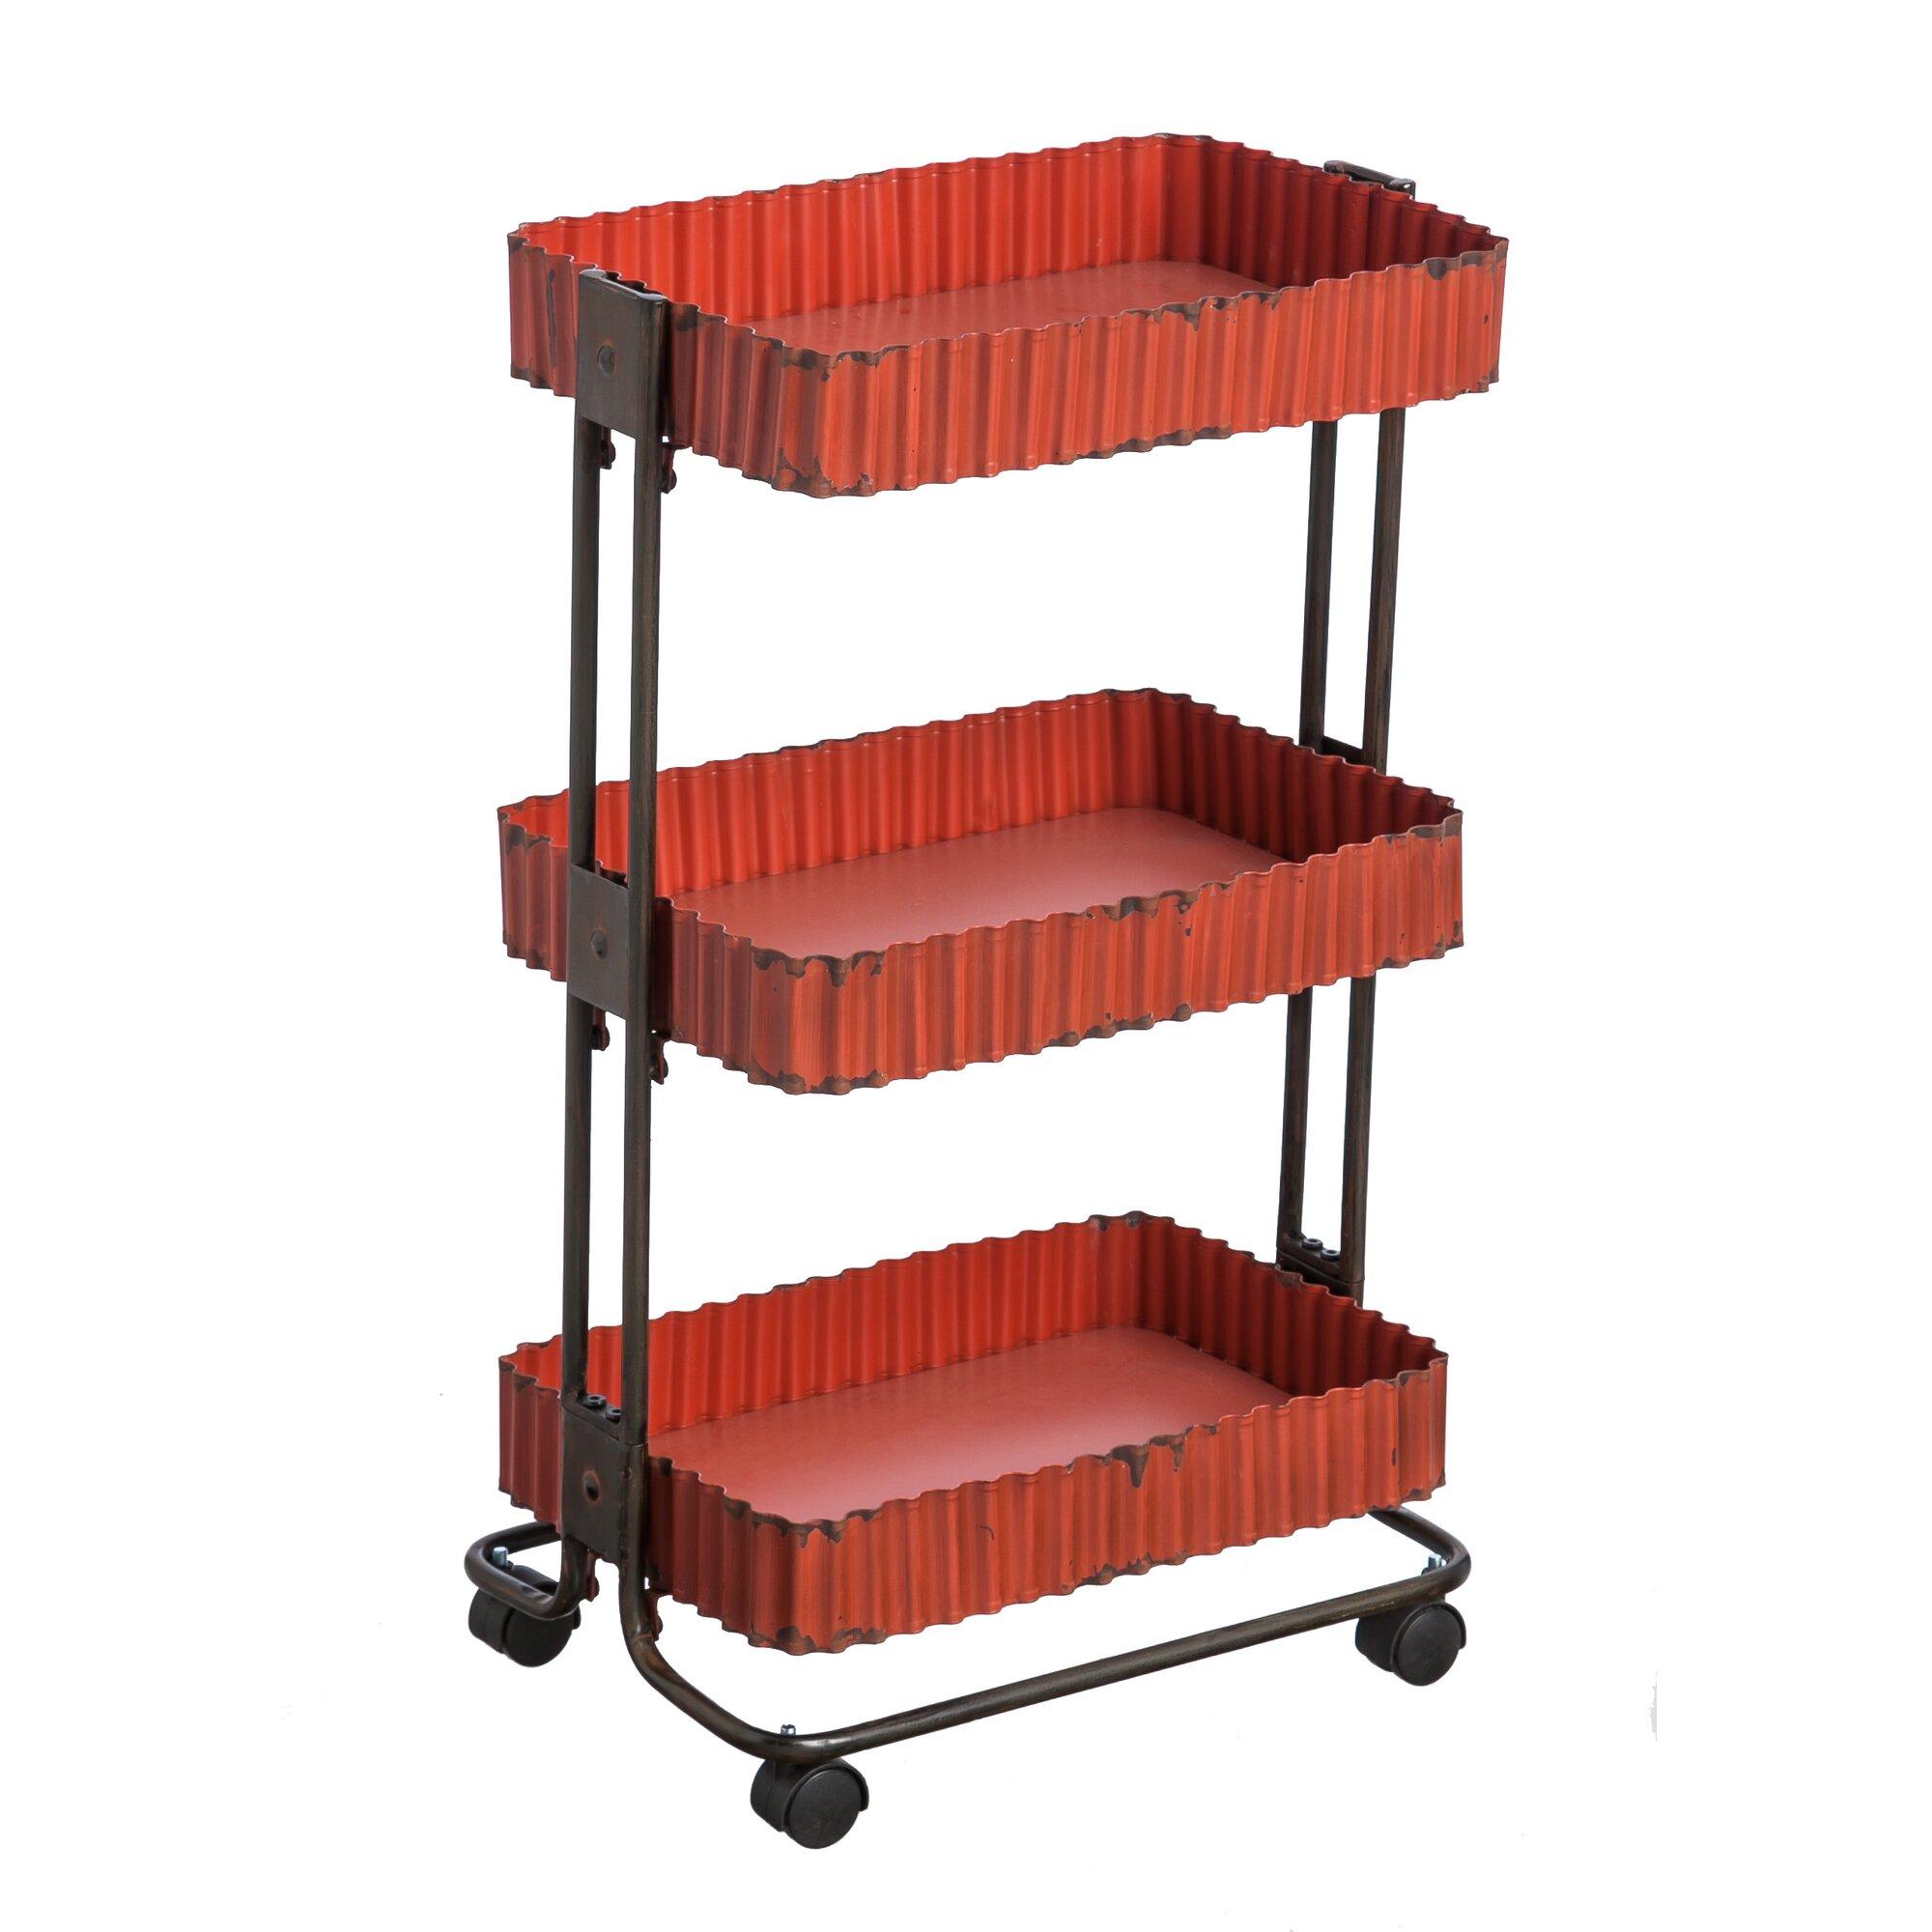 Kitchen cart metal - 3 Tier Metal Utility Cart